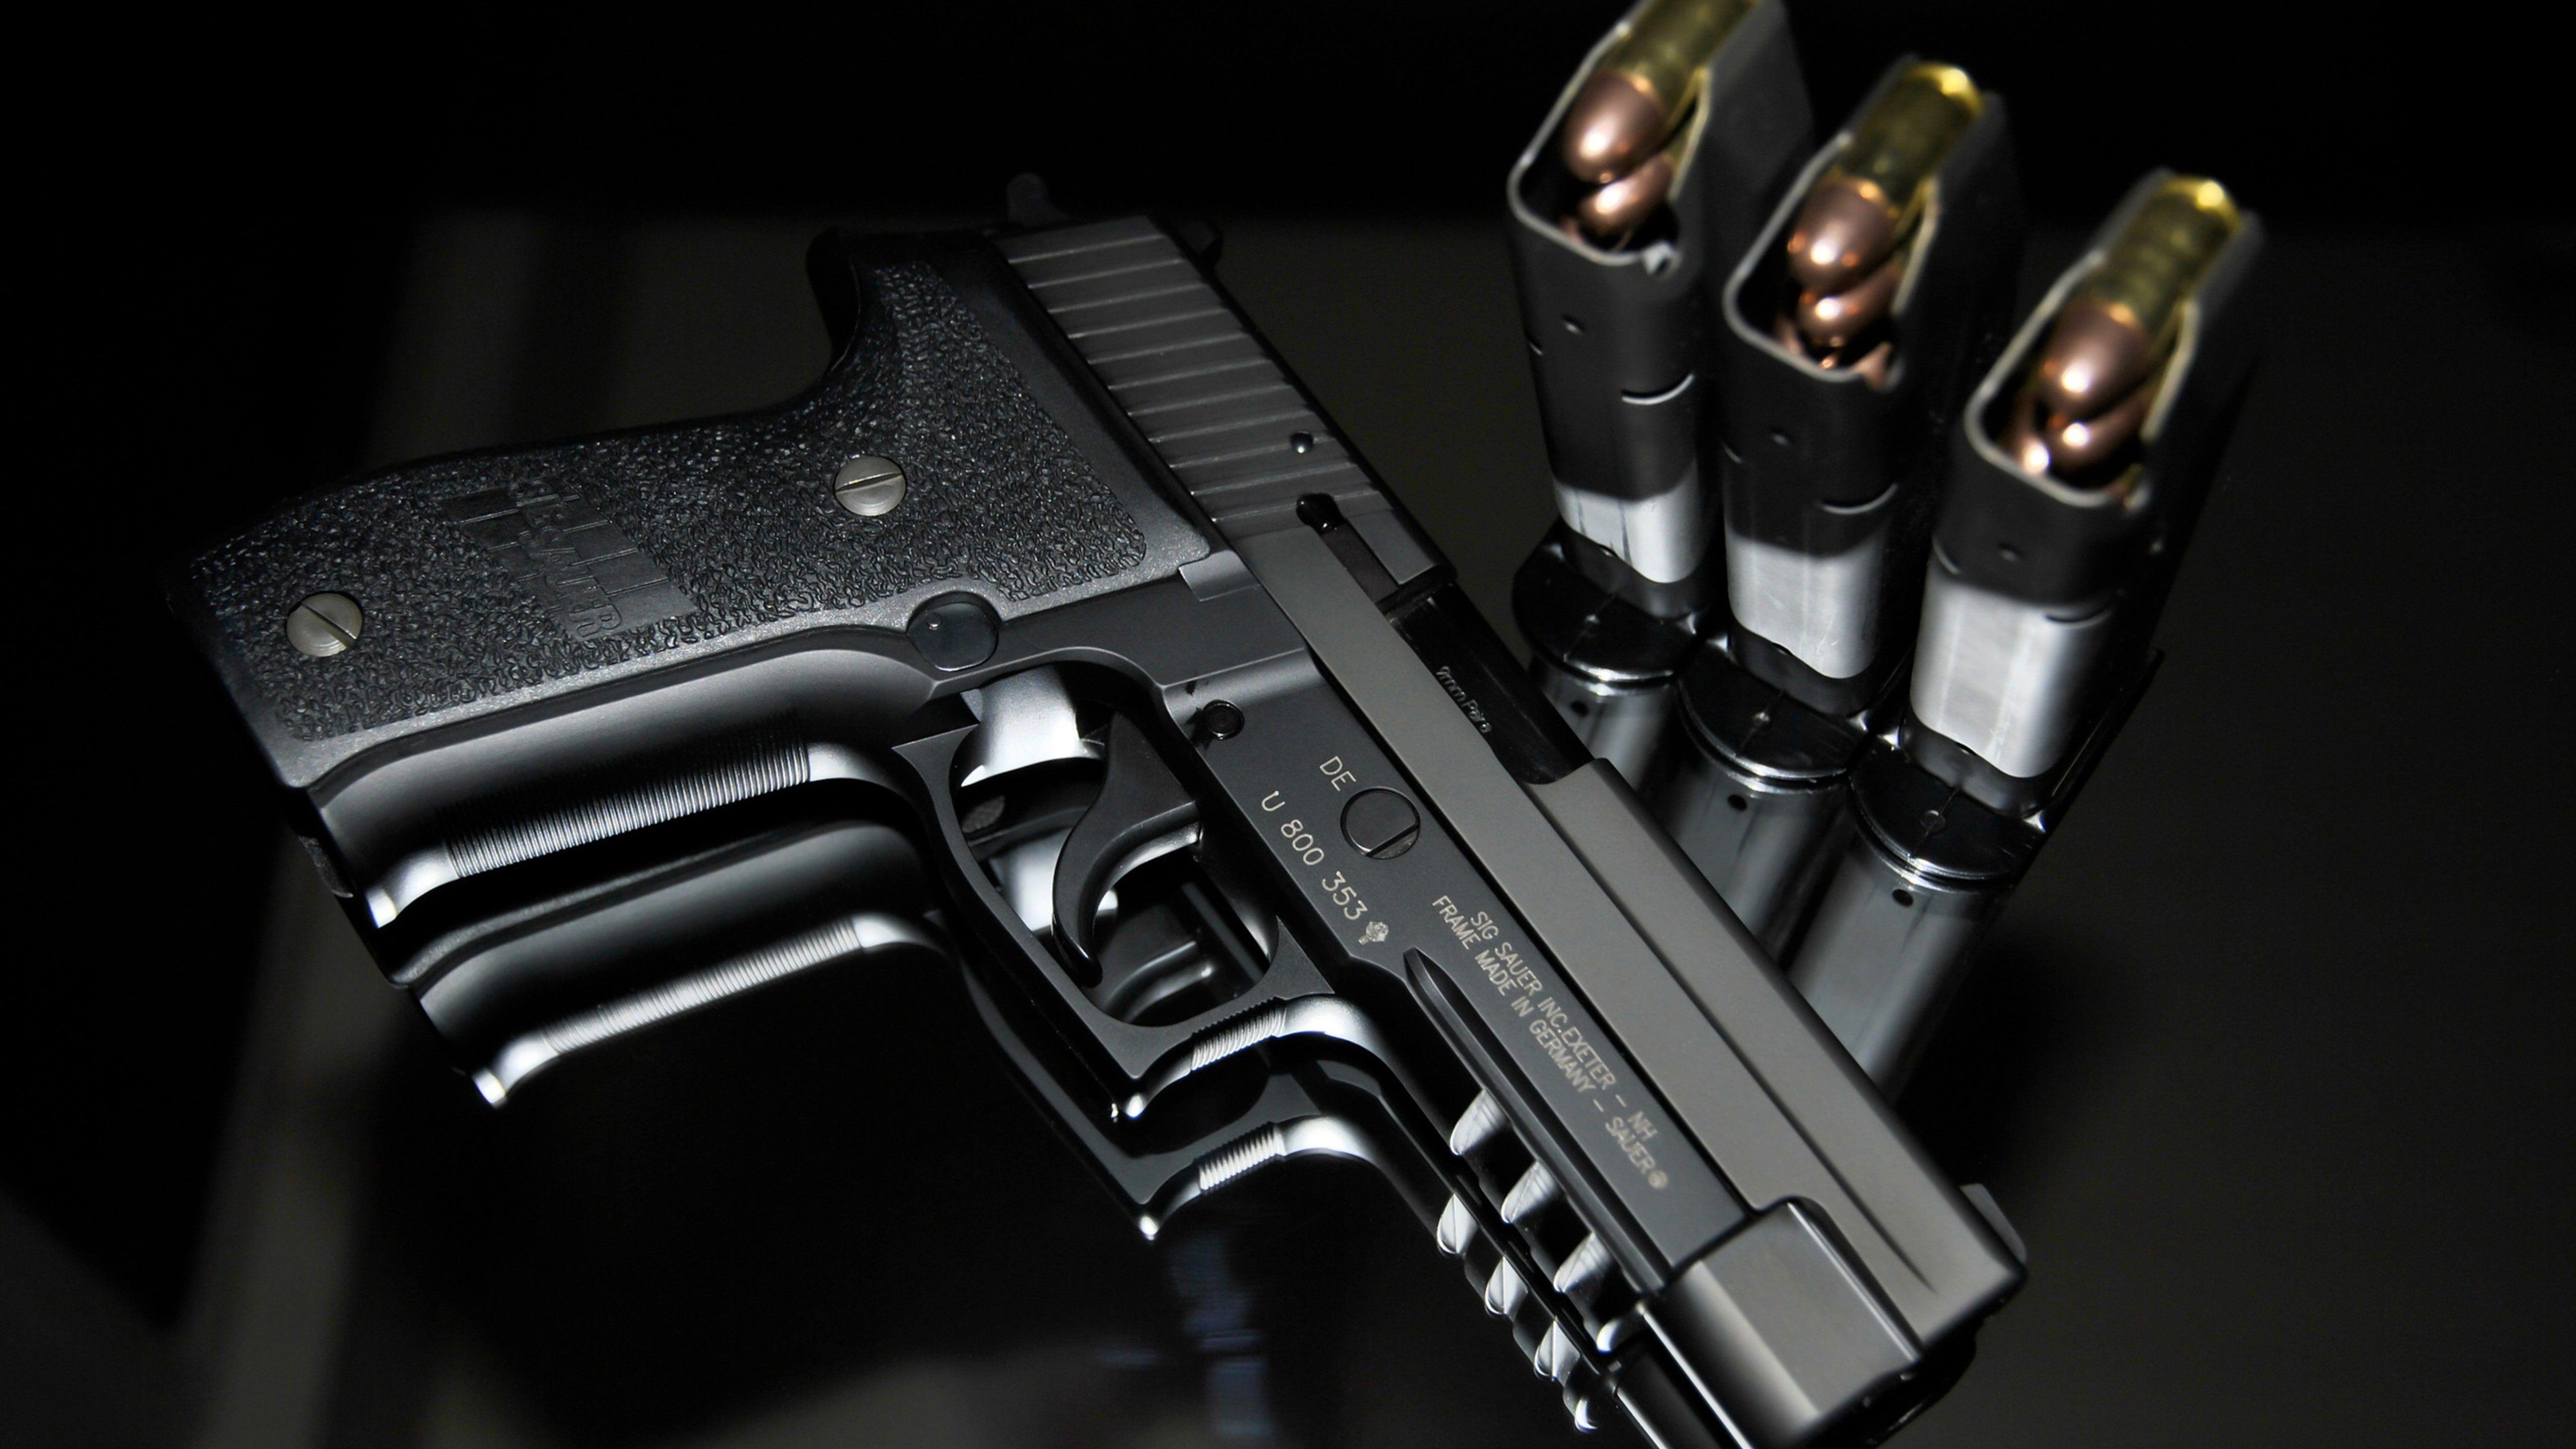 Pin On Random Guns and bullets hd wallpaper